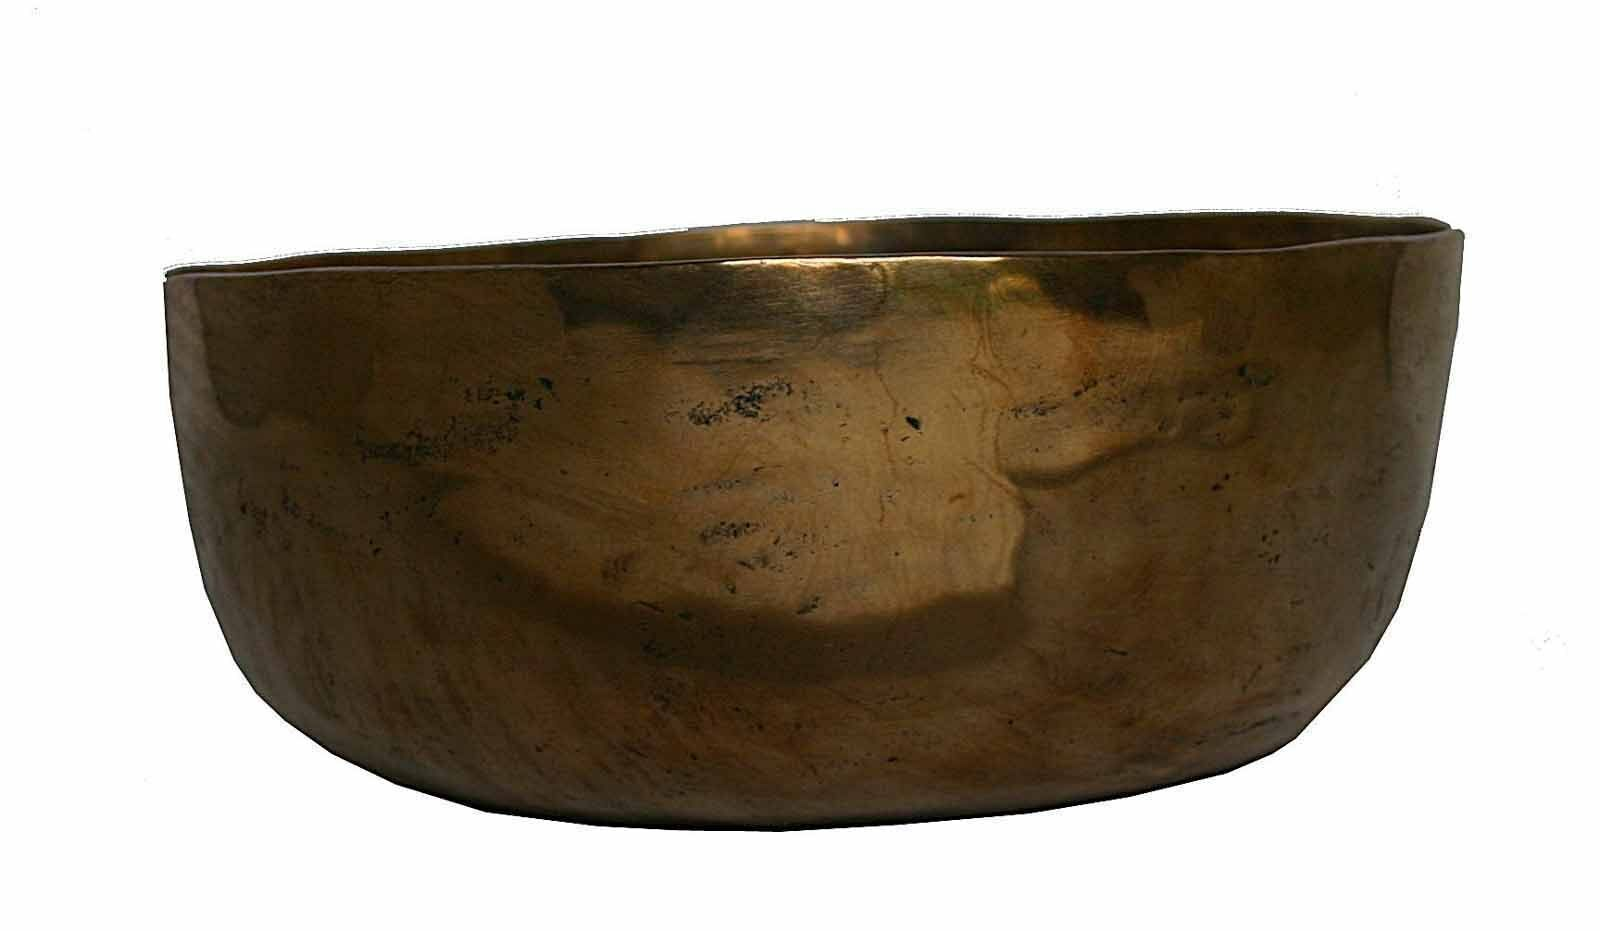 Klangschale Singing Bowl Halsschale Schulterschale Meditation Hörprobe 440g M72B